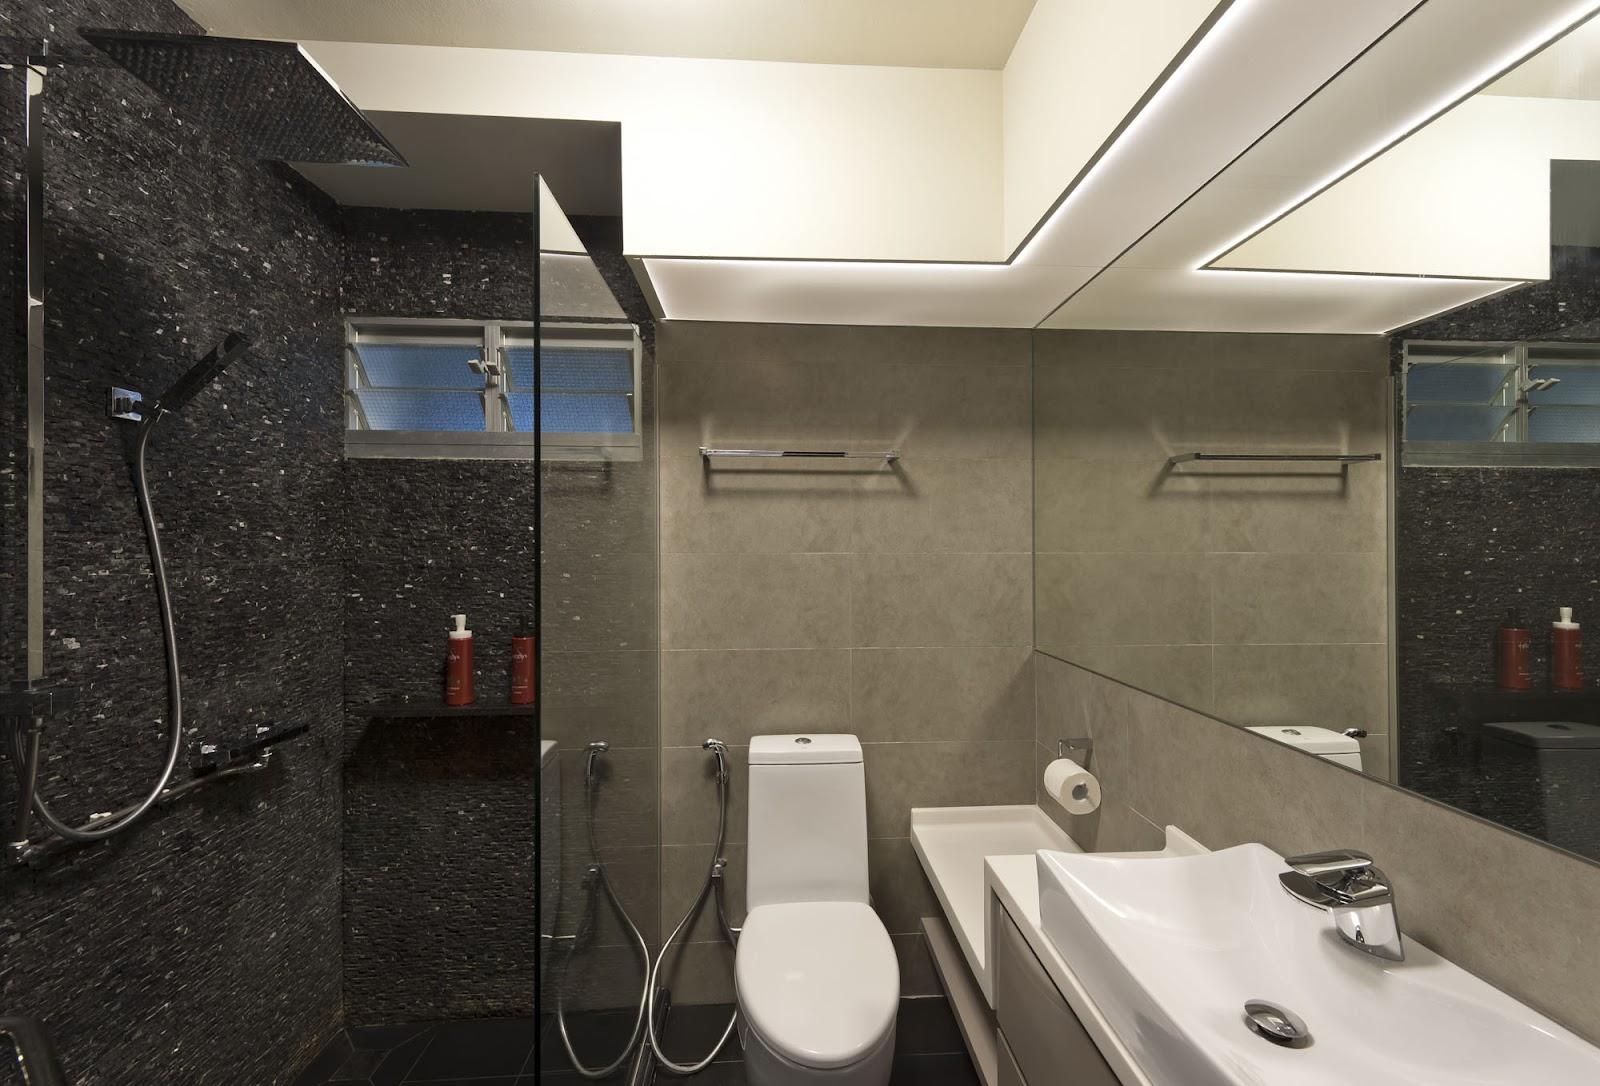 Rezt relax interior design 4 room hdb yishun for Toilet renovation design